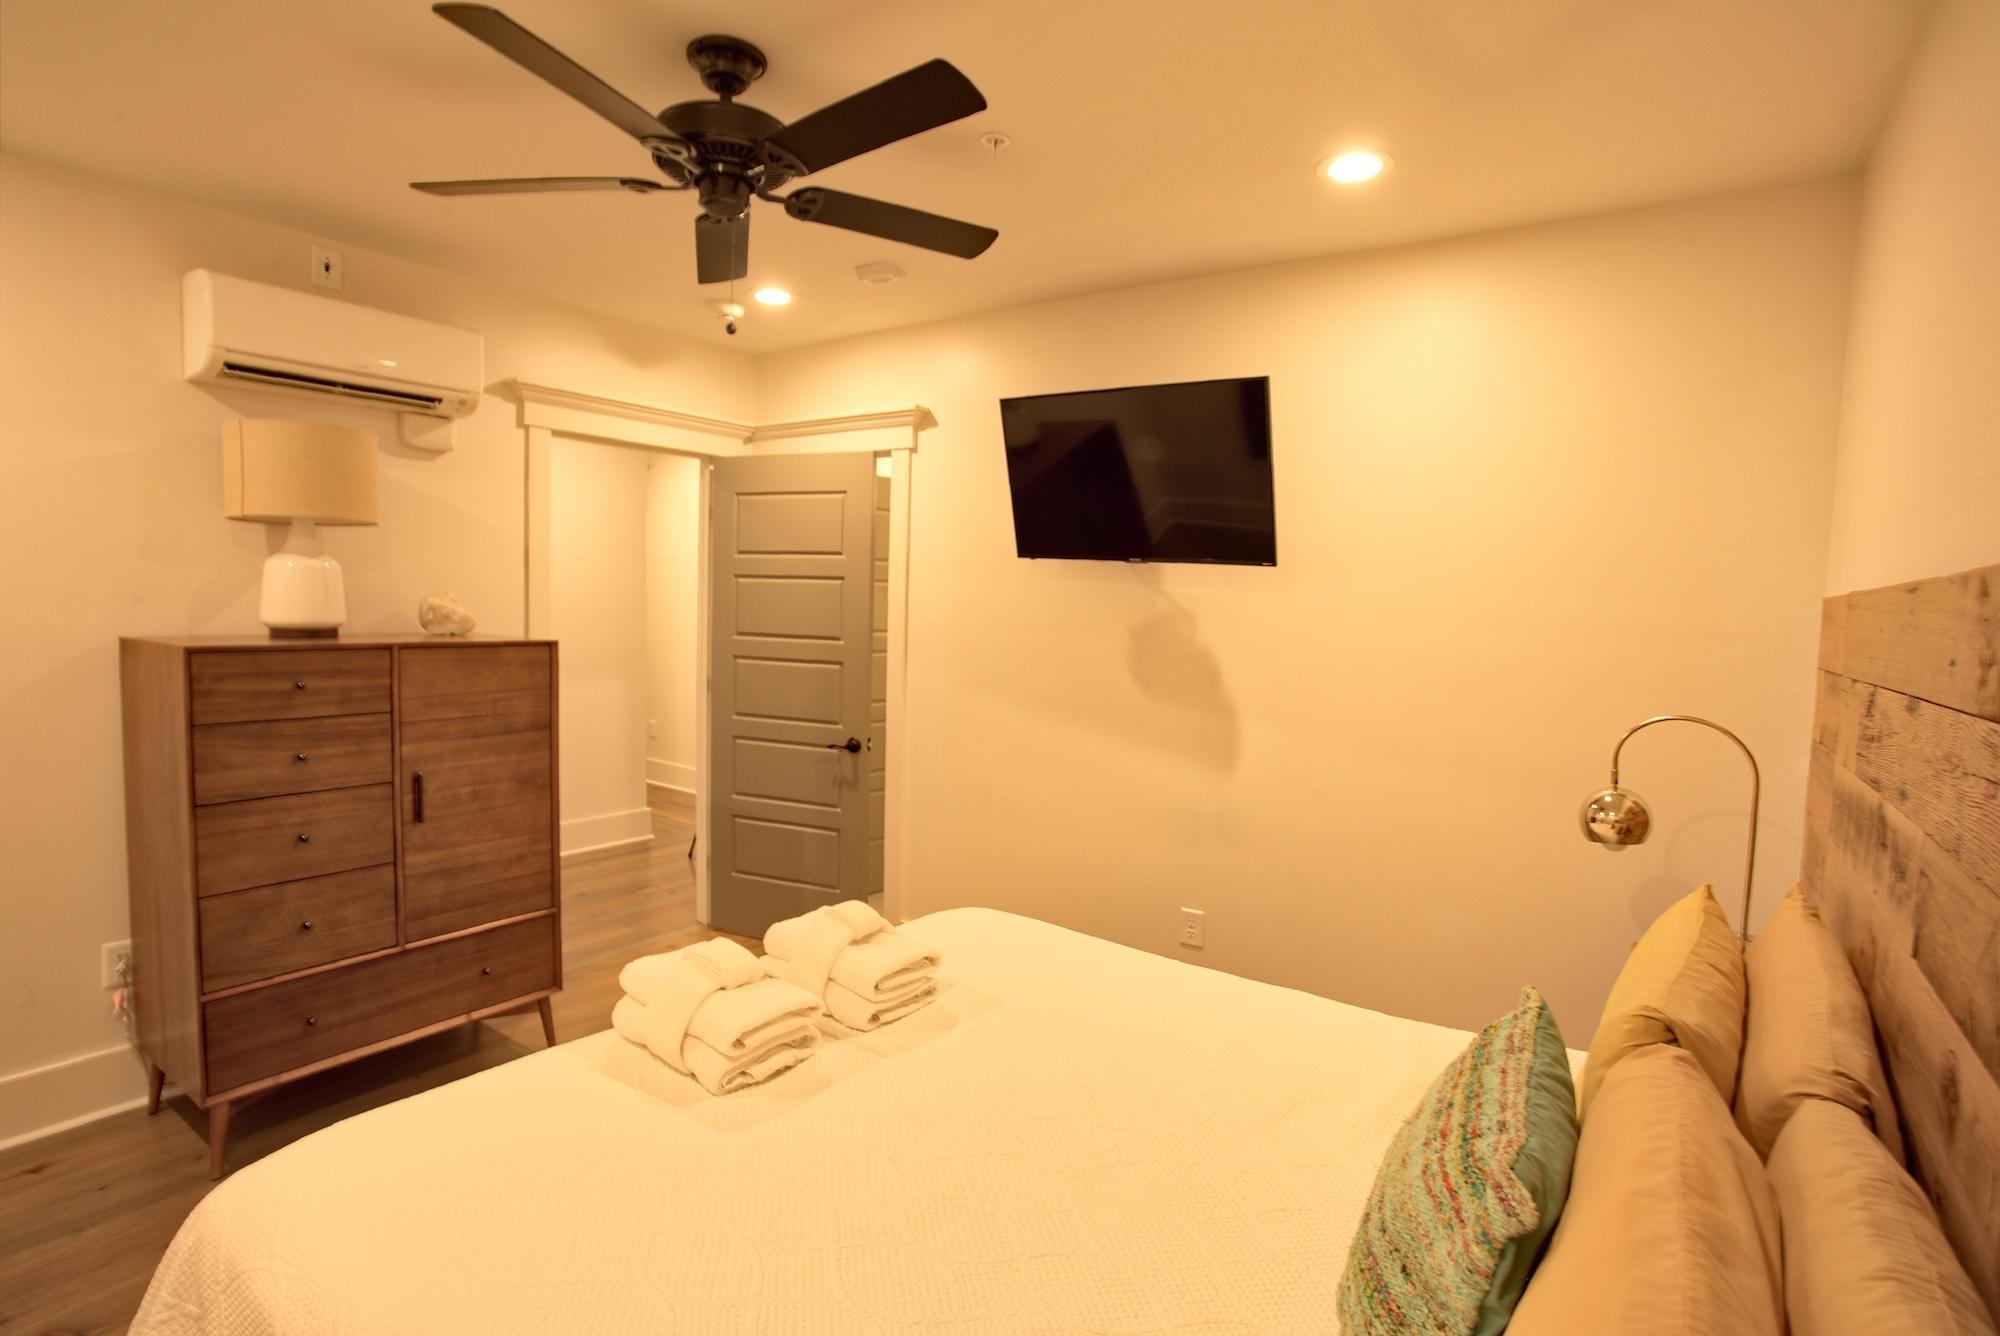 Suite on King Street Charleston SC Vacation Rental The Gullah Suite28.jpeg